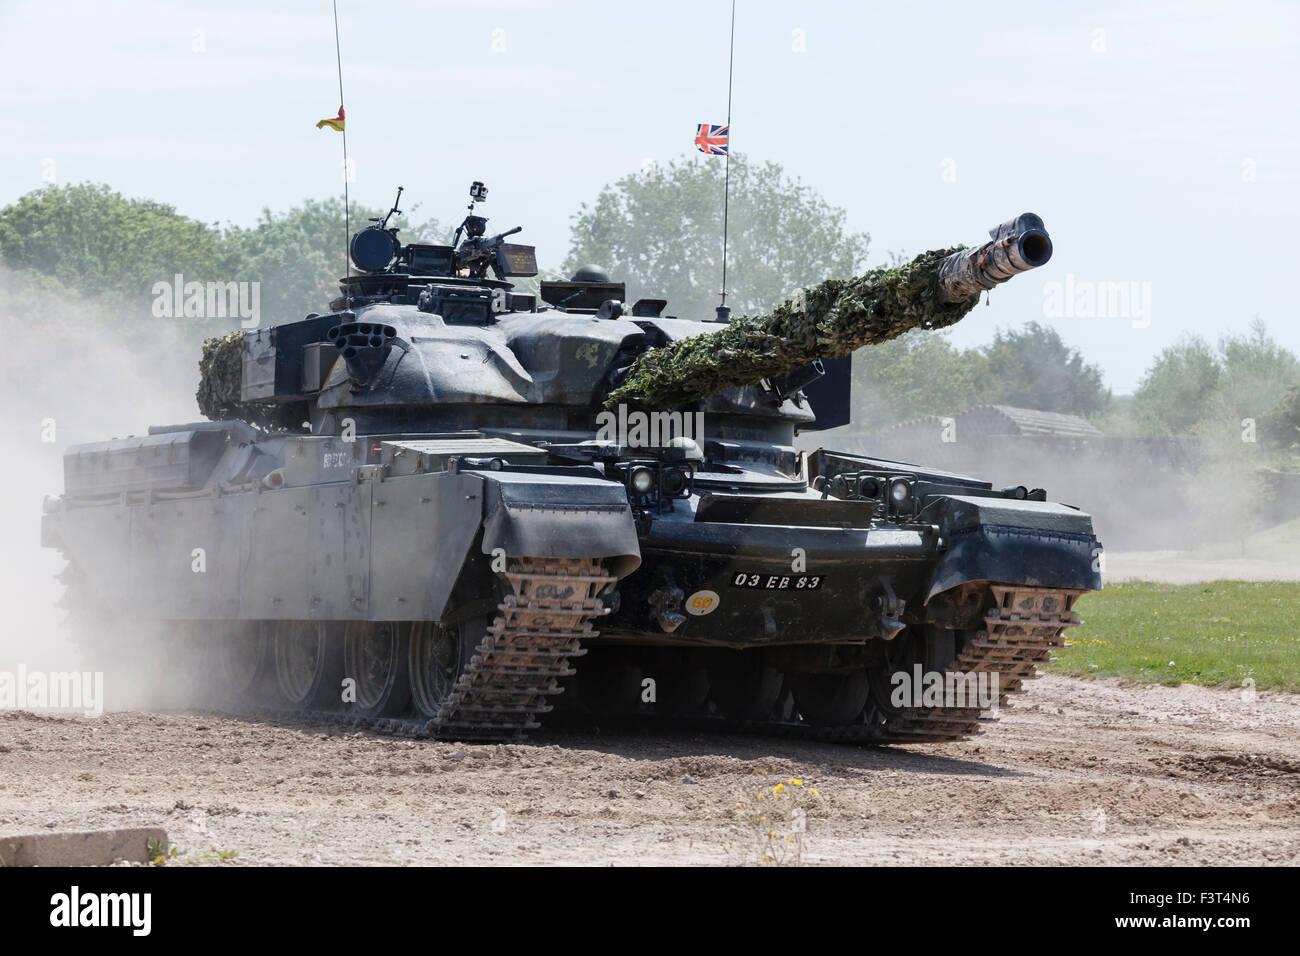 Chieftain Tank, The Tank Museum, Bovington, Dorset - Stock Image